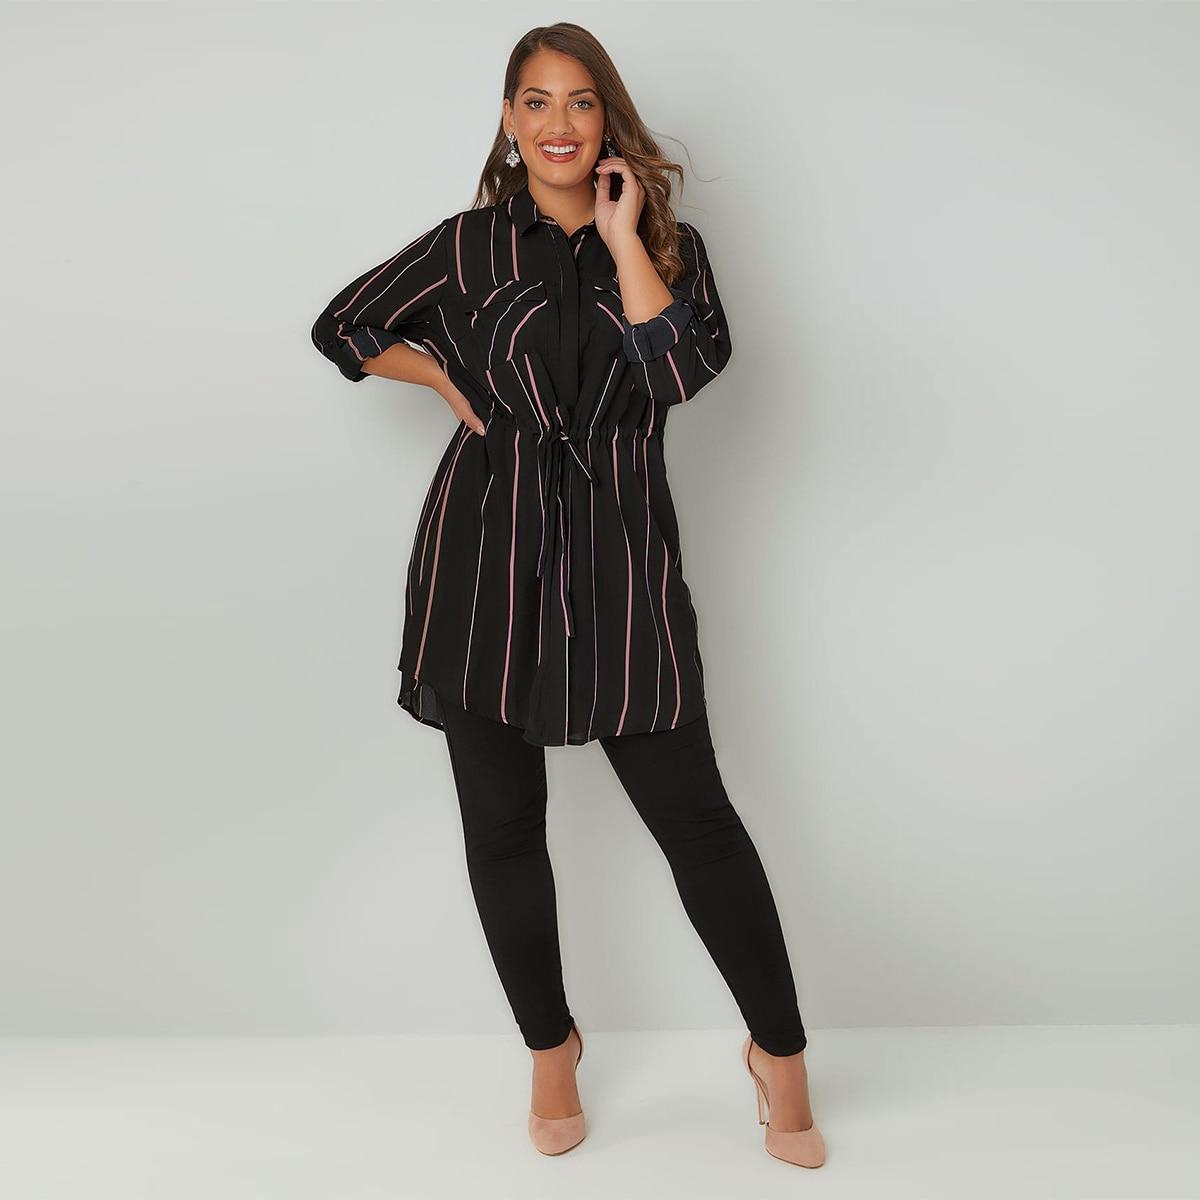 MCO 2018 Spring Simple Tie Waist Plus Size OL Stripe Shirt Casual Oversize Long Office Ladies Blouse Basic Big Women Top 6xl 7xl 3